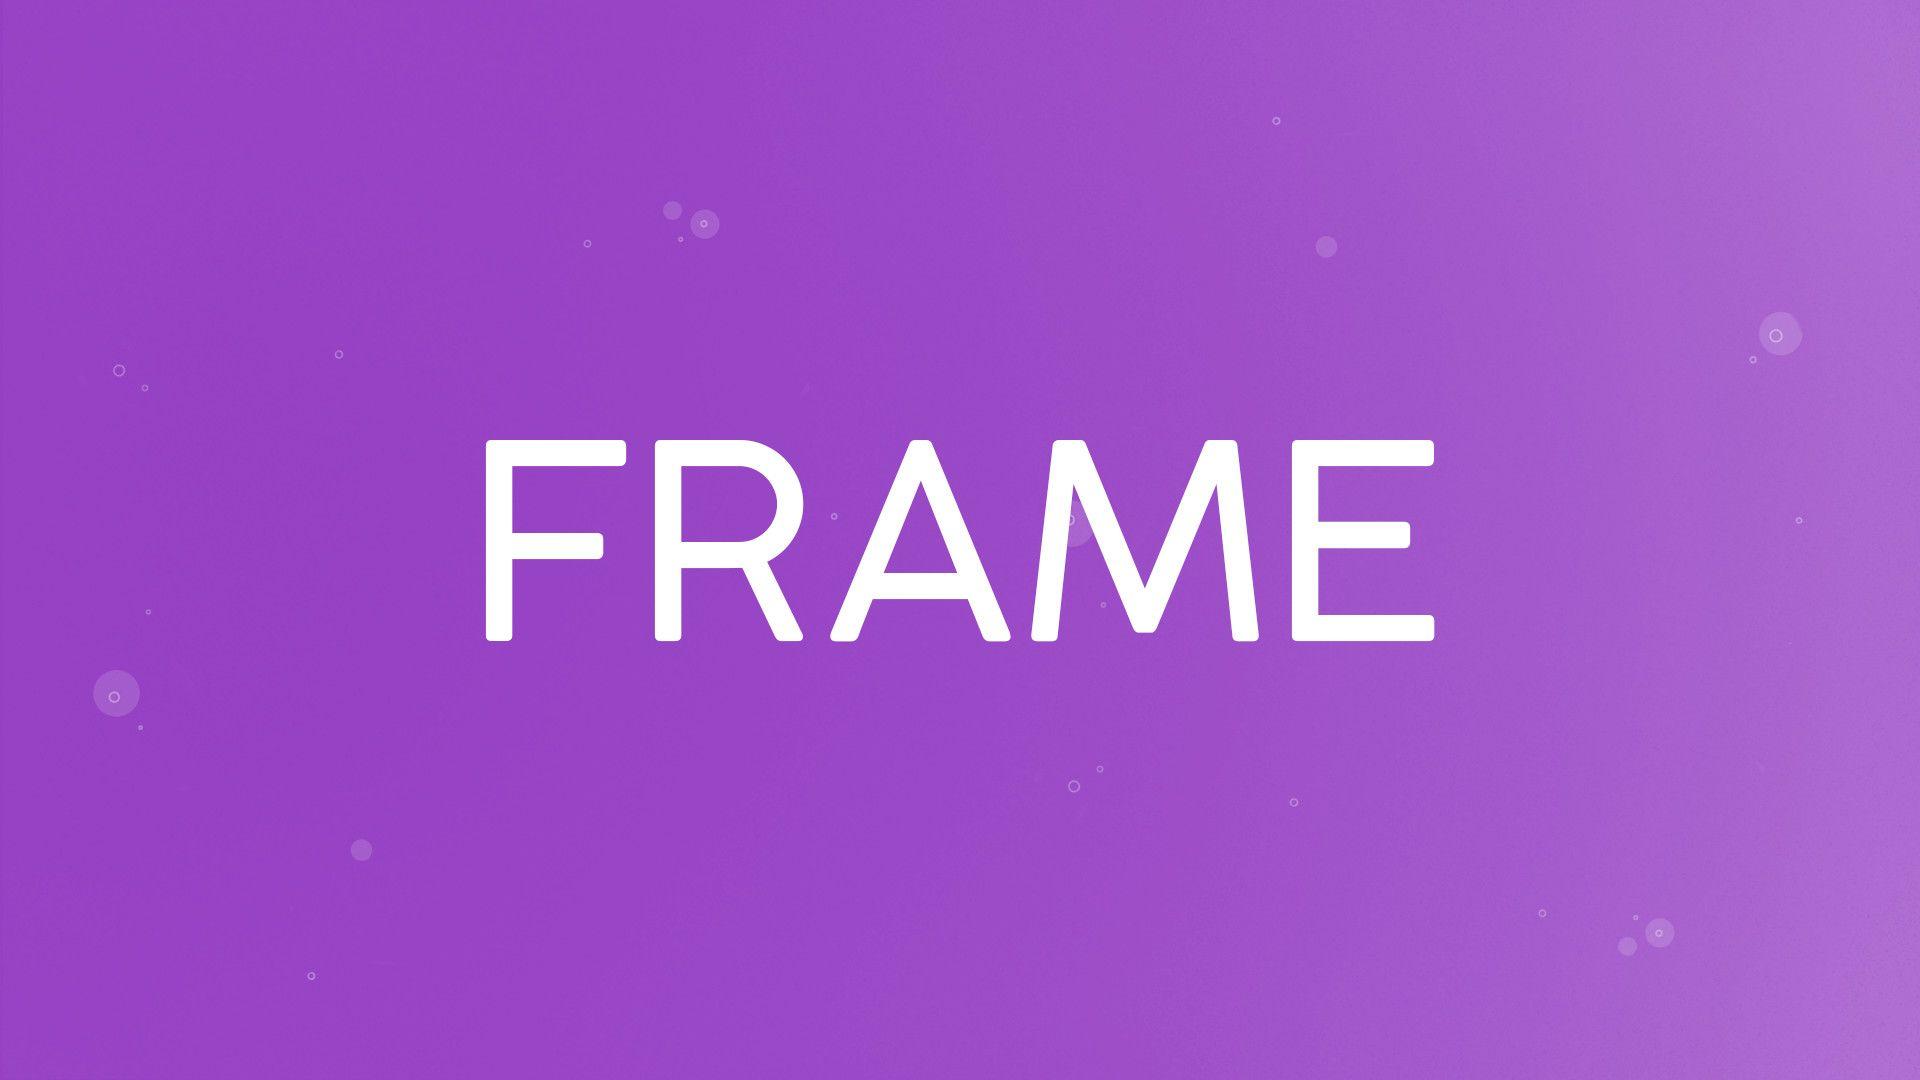 Controls: Frame